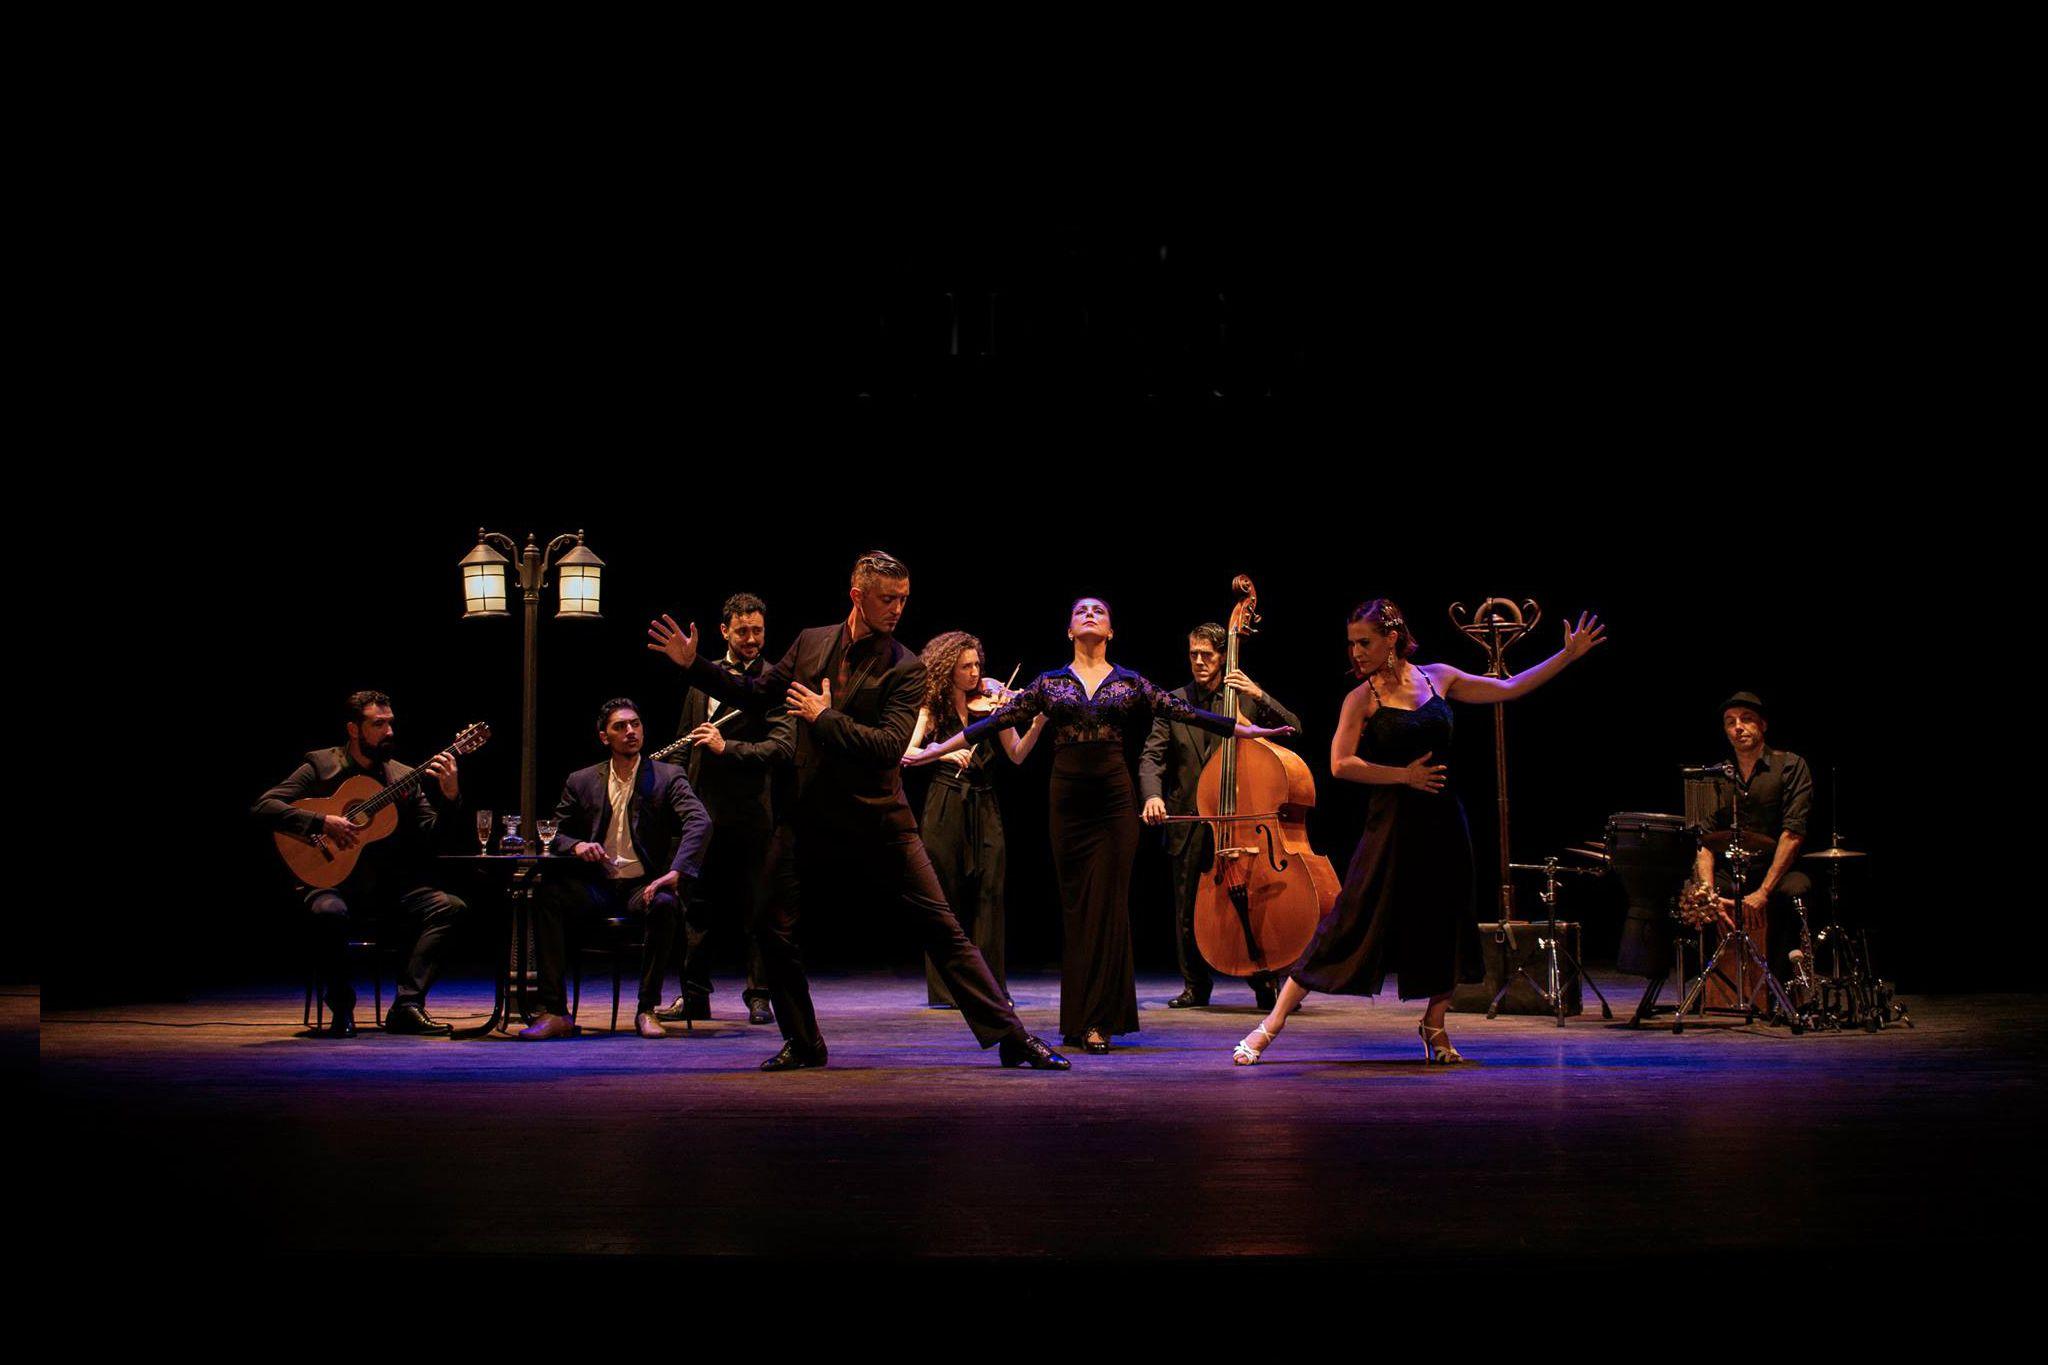 Compañía La Milonga flamenca de Málaga